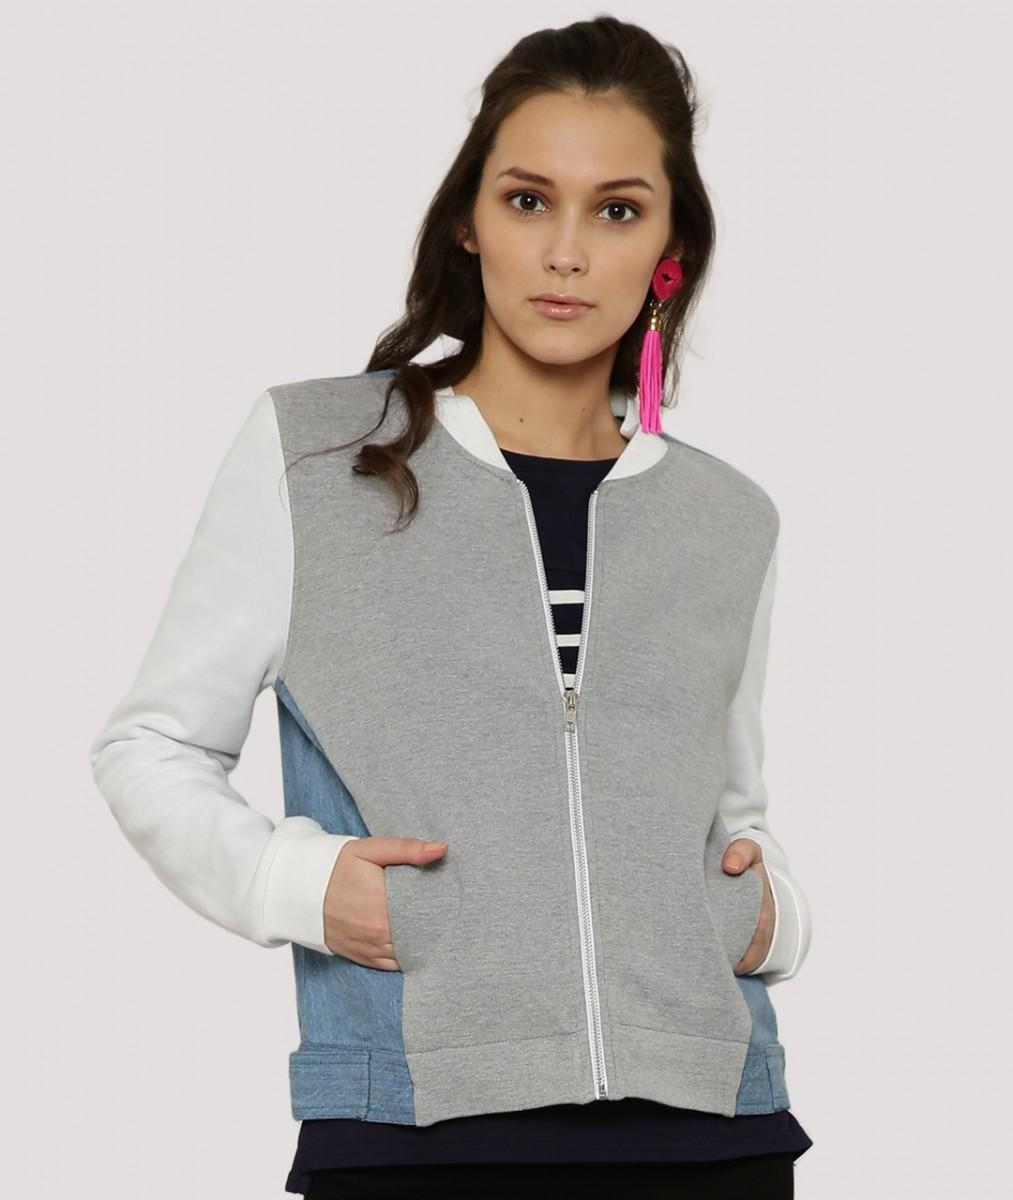 Koovs Winter fleece jacket for autumn